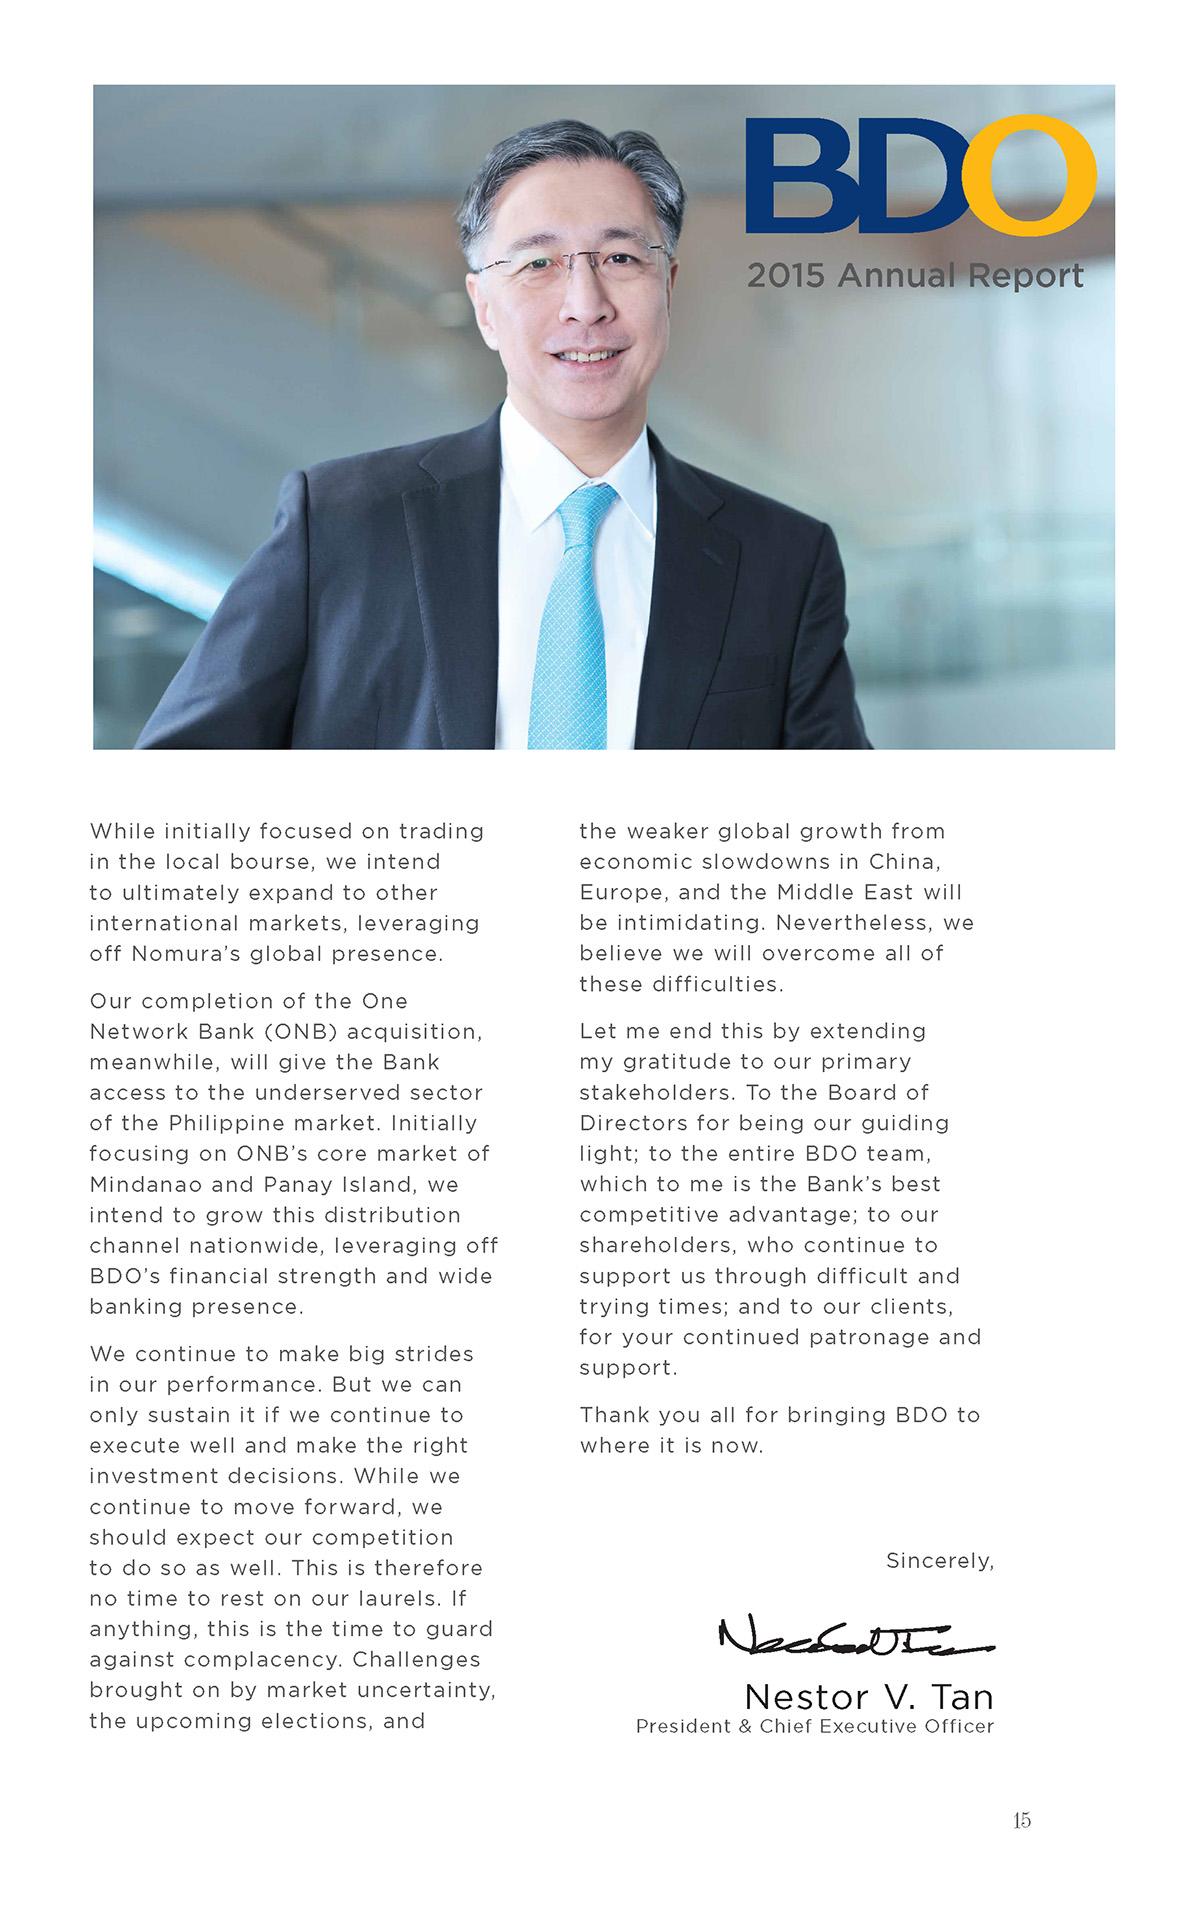 BDO 2015 Annual Report-Nestor Tan